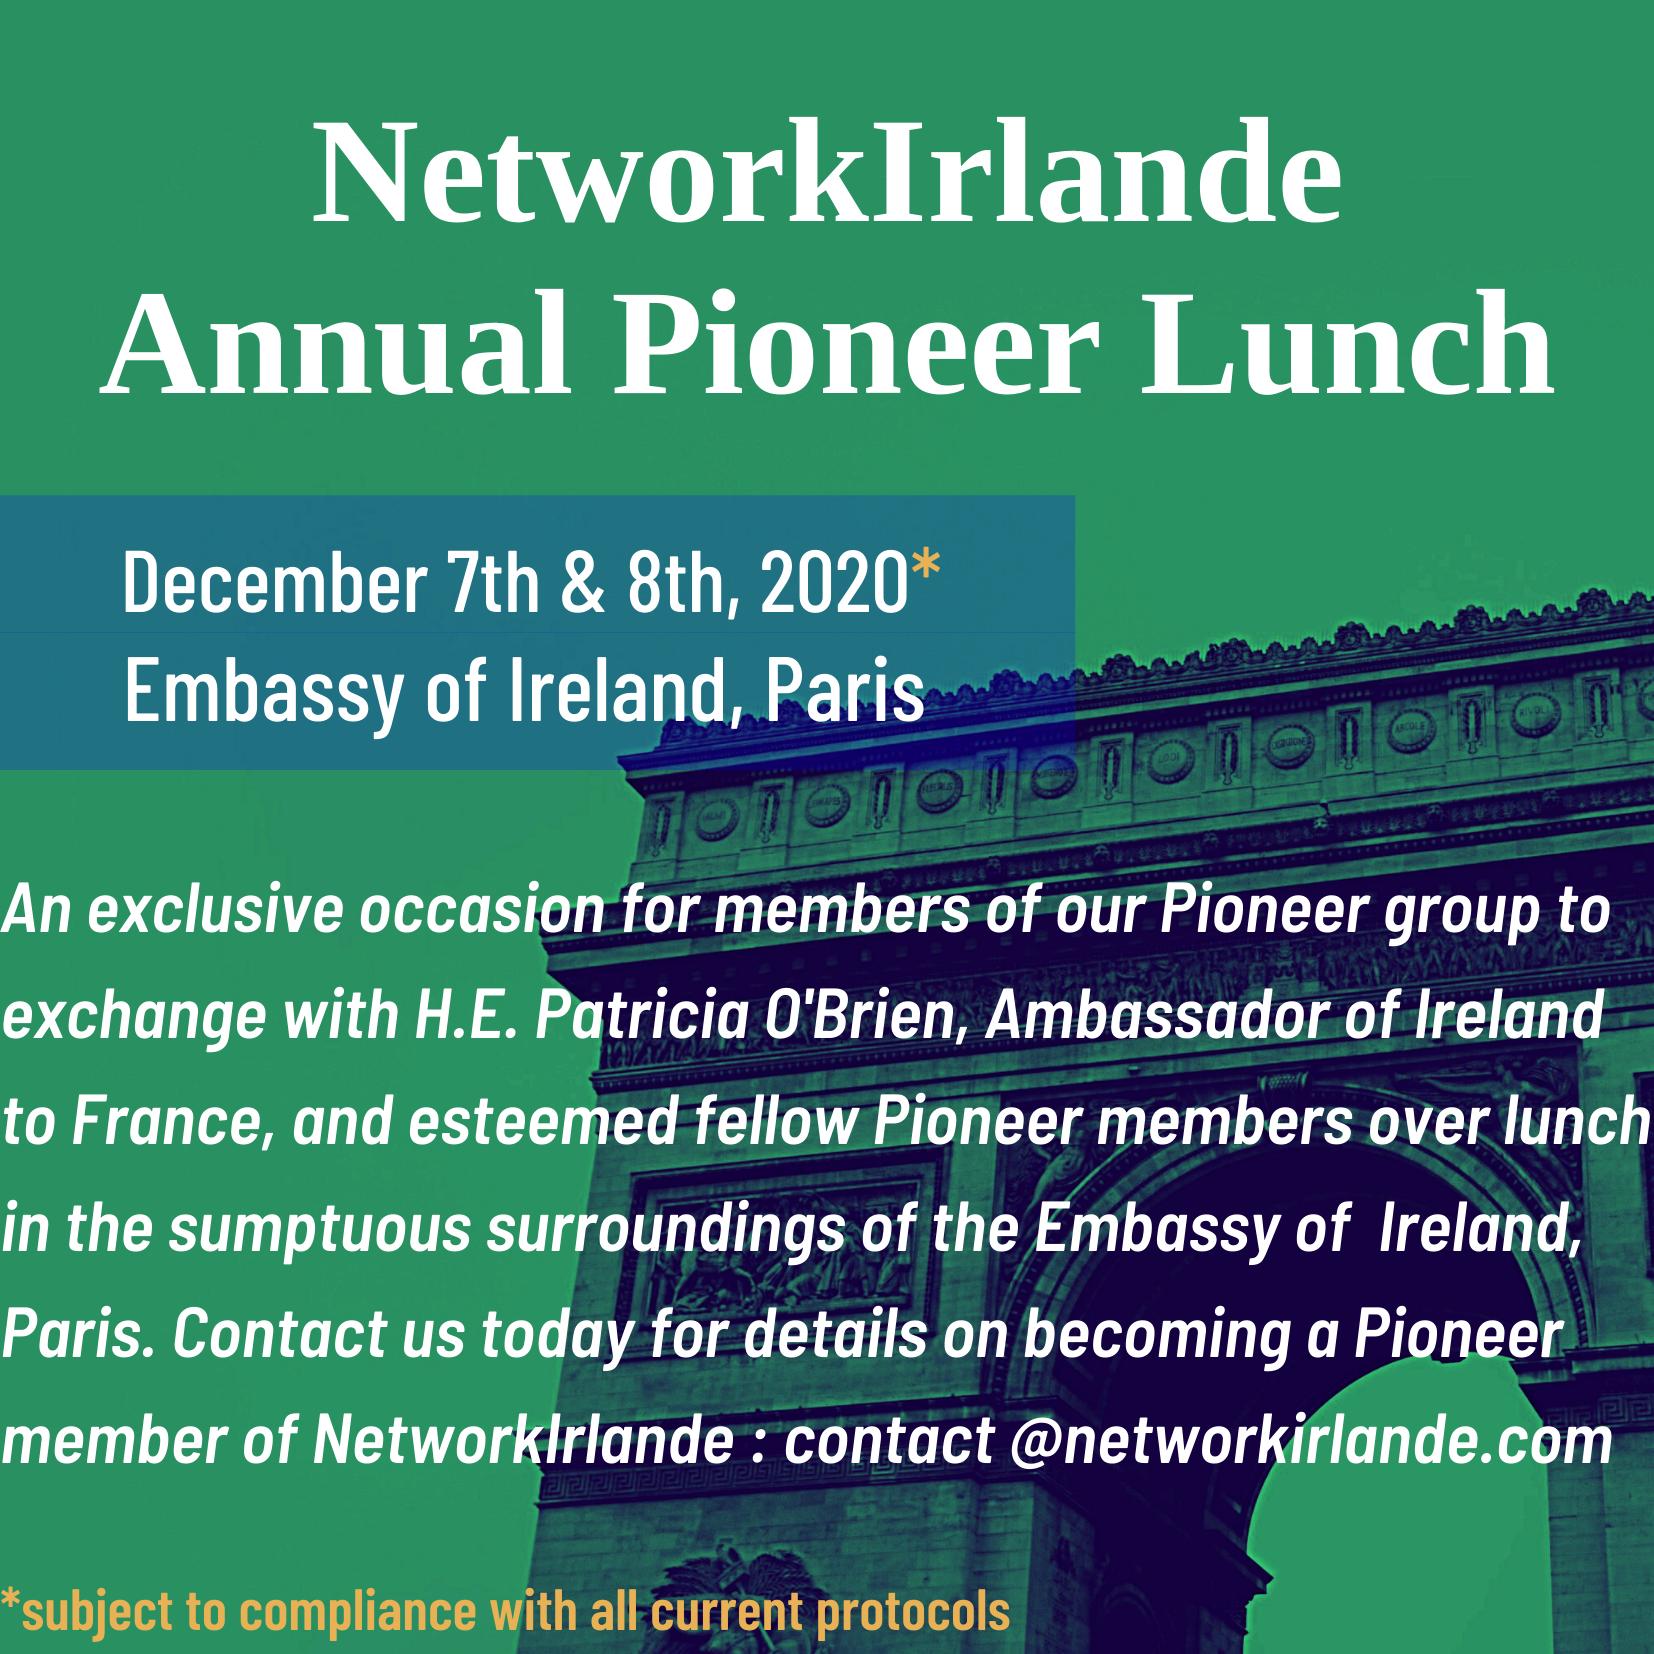 NetworkIrlande Pioneer Lunch